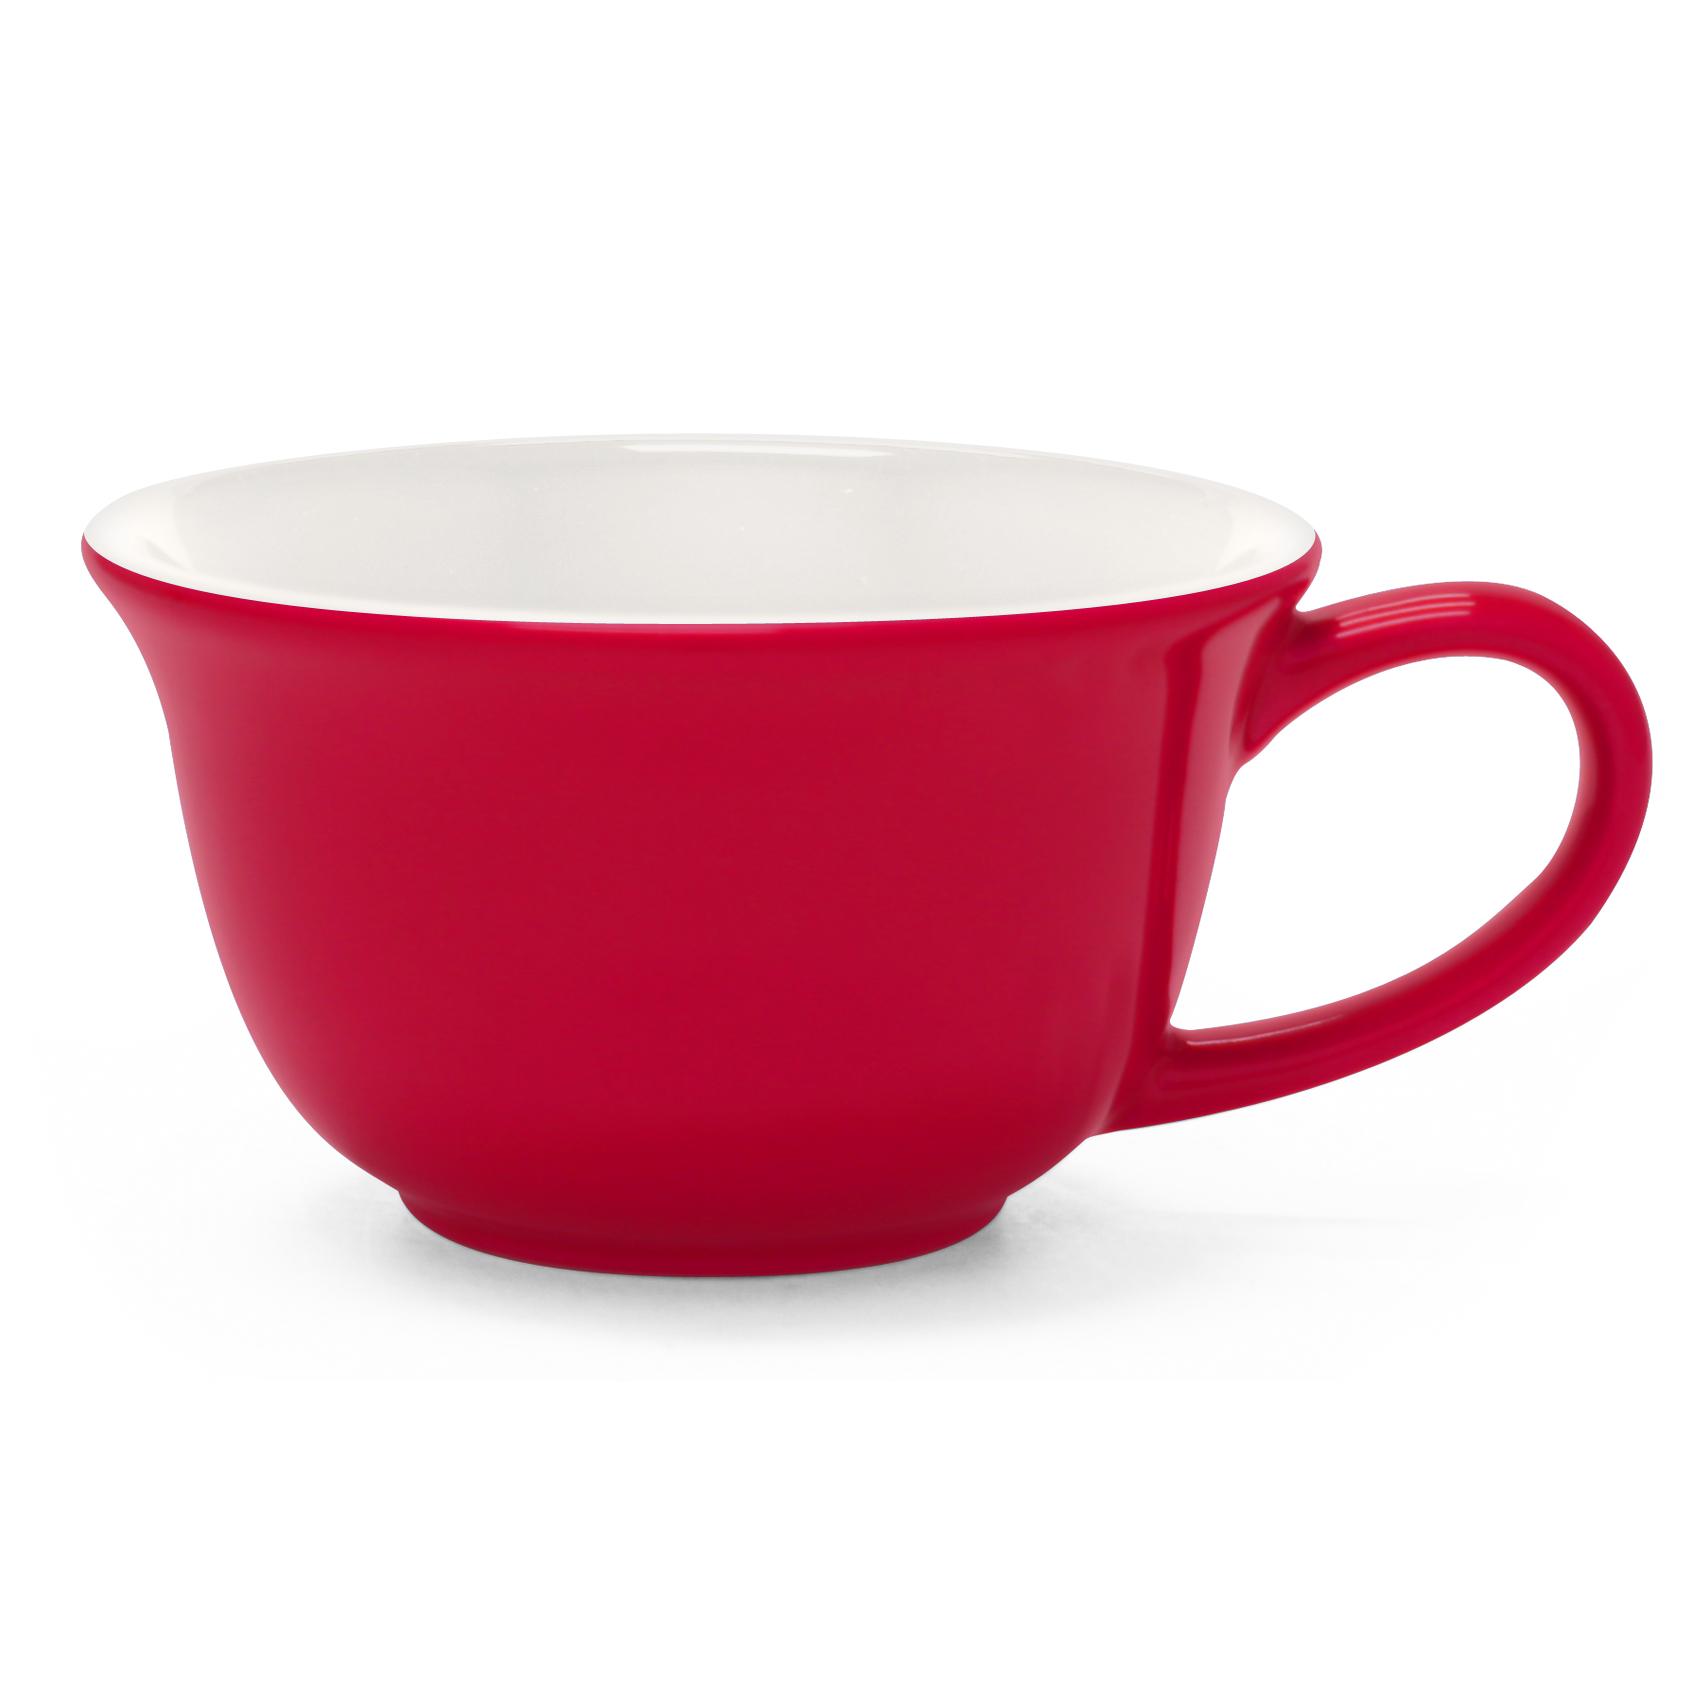 Chantal Red and White 8 Ounce Tea Lover's Mug